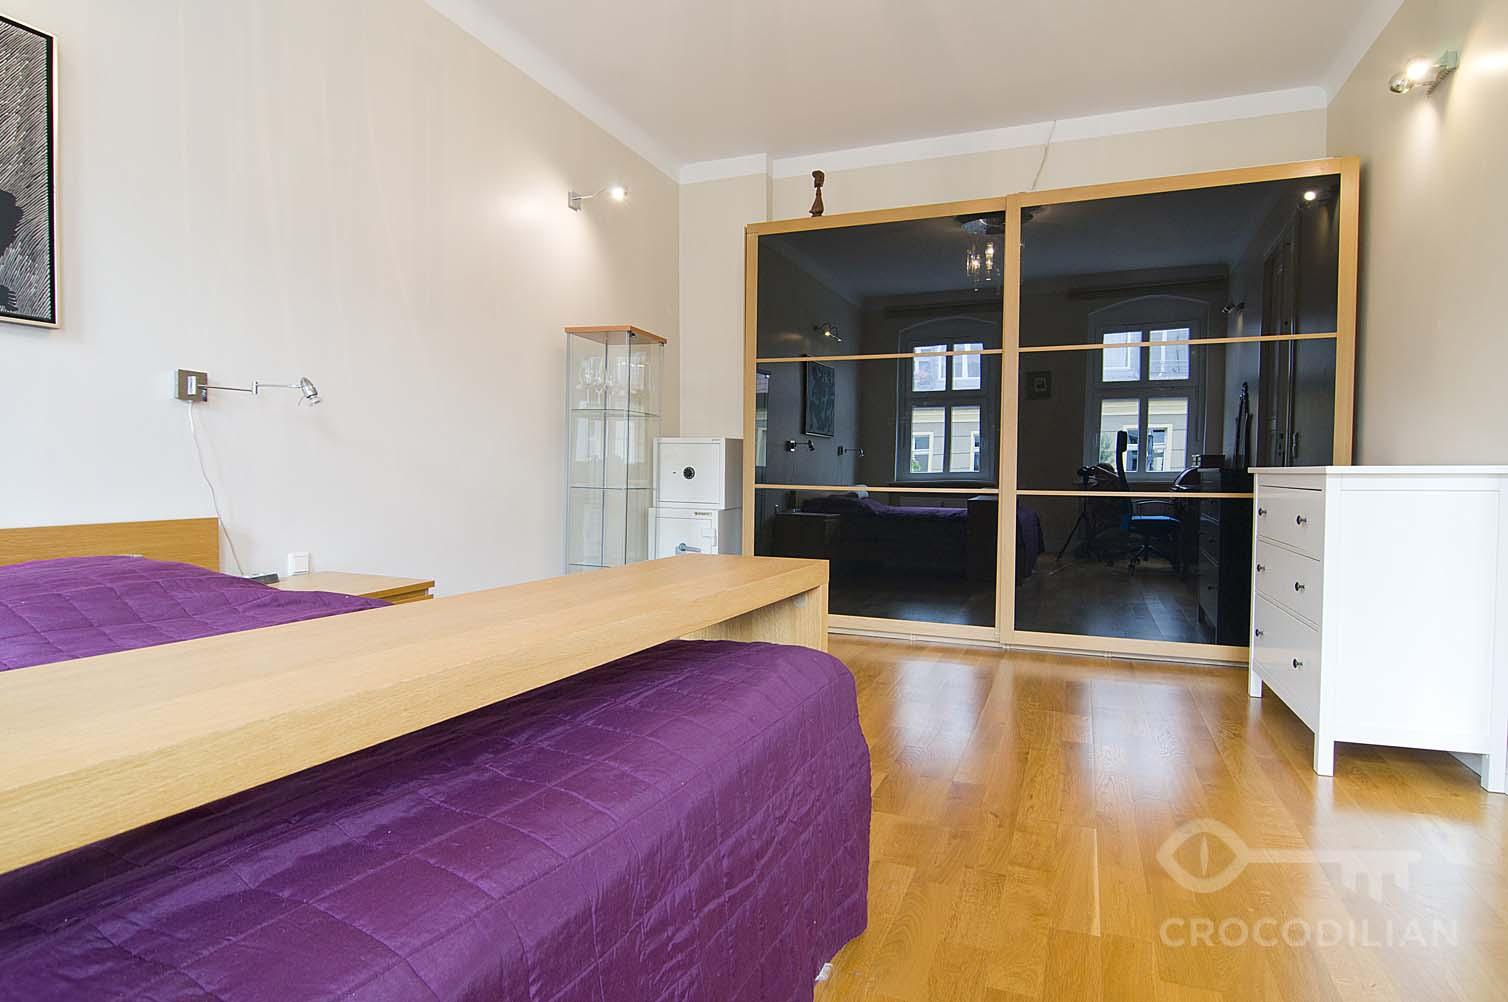 Spacious 4 Room Apartment 2 Bedrooms In Popular Area